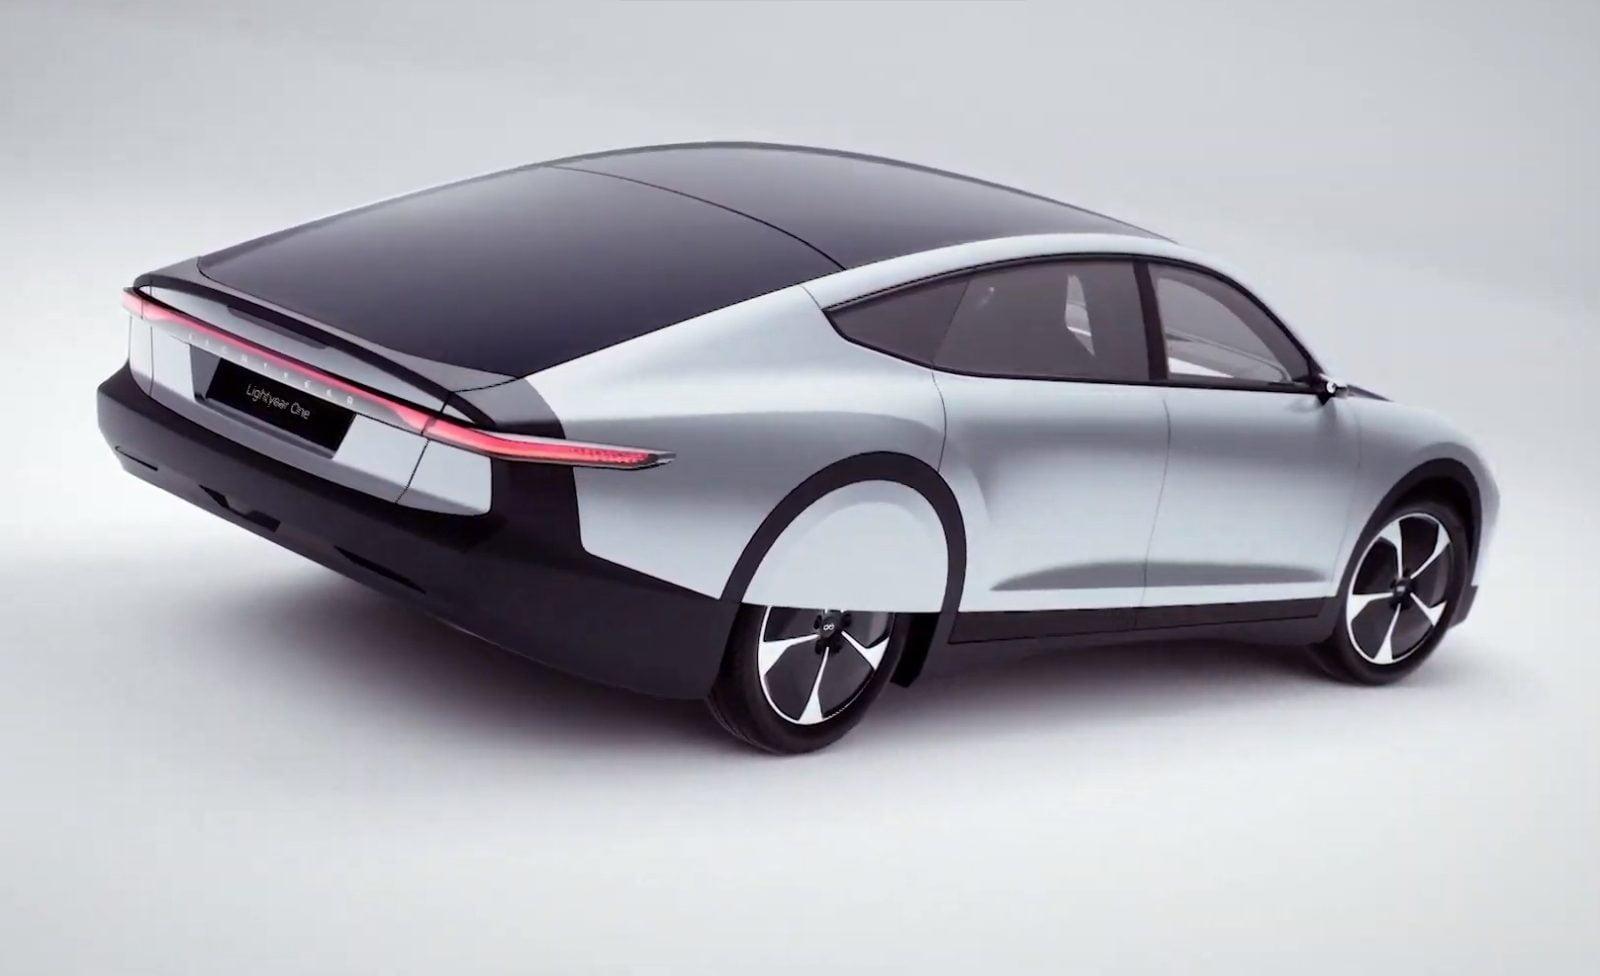 Kleurplaten Jaguar Auto.Tesla Rival Alert Dutch Car Maker Lightyear Unveils Solar